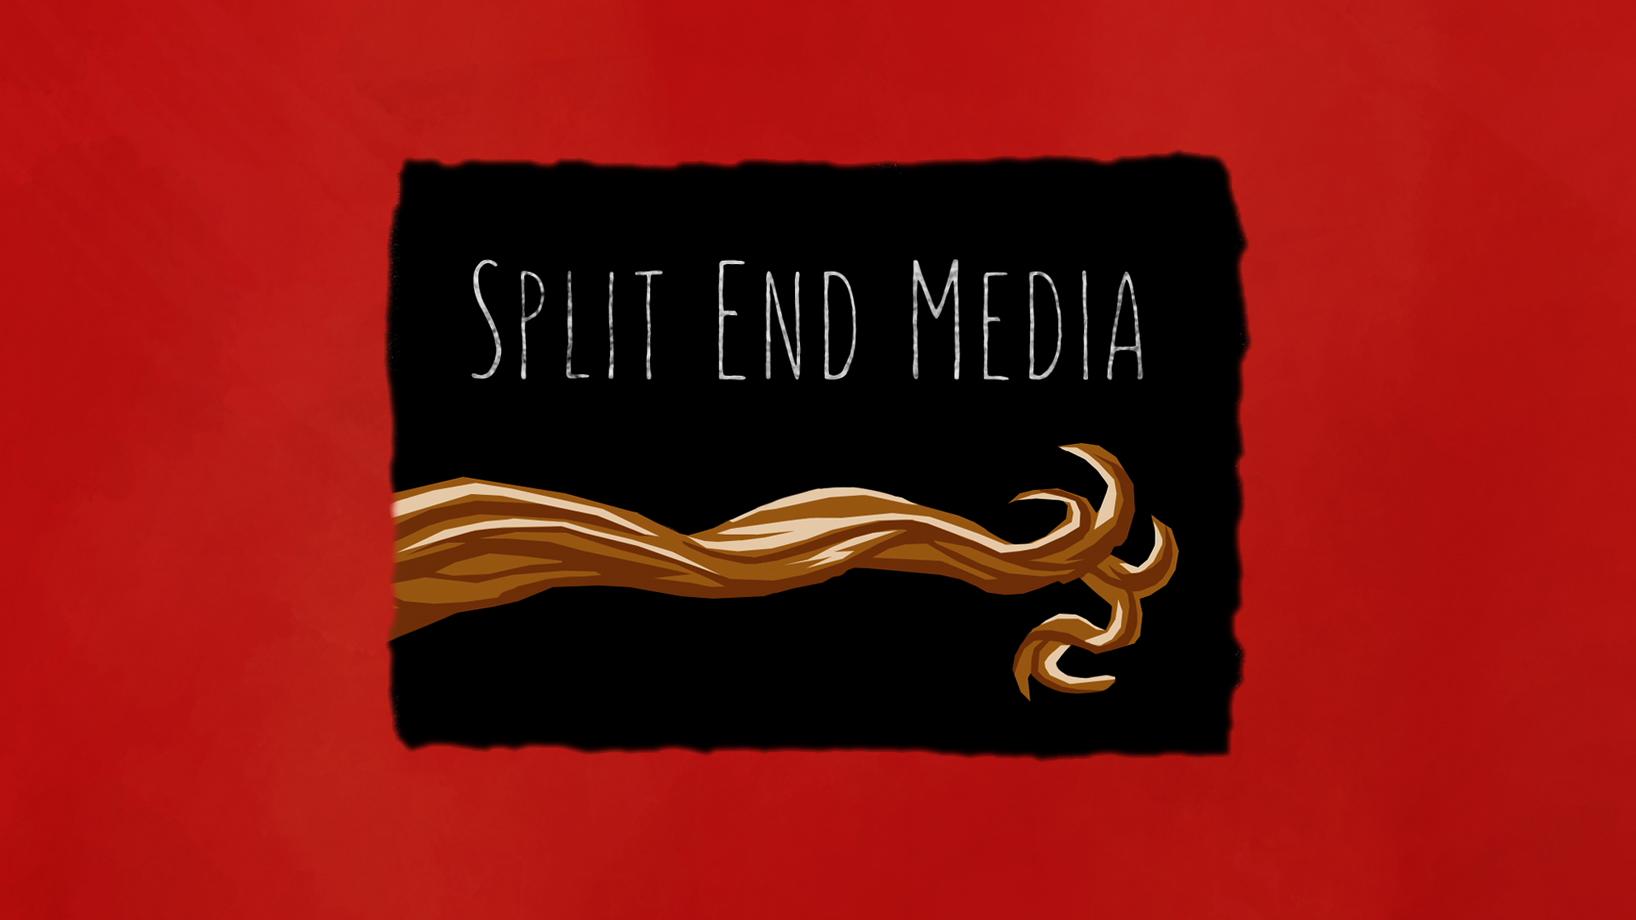 Credits-19-SplitEndMedia 1.jpg